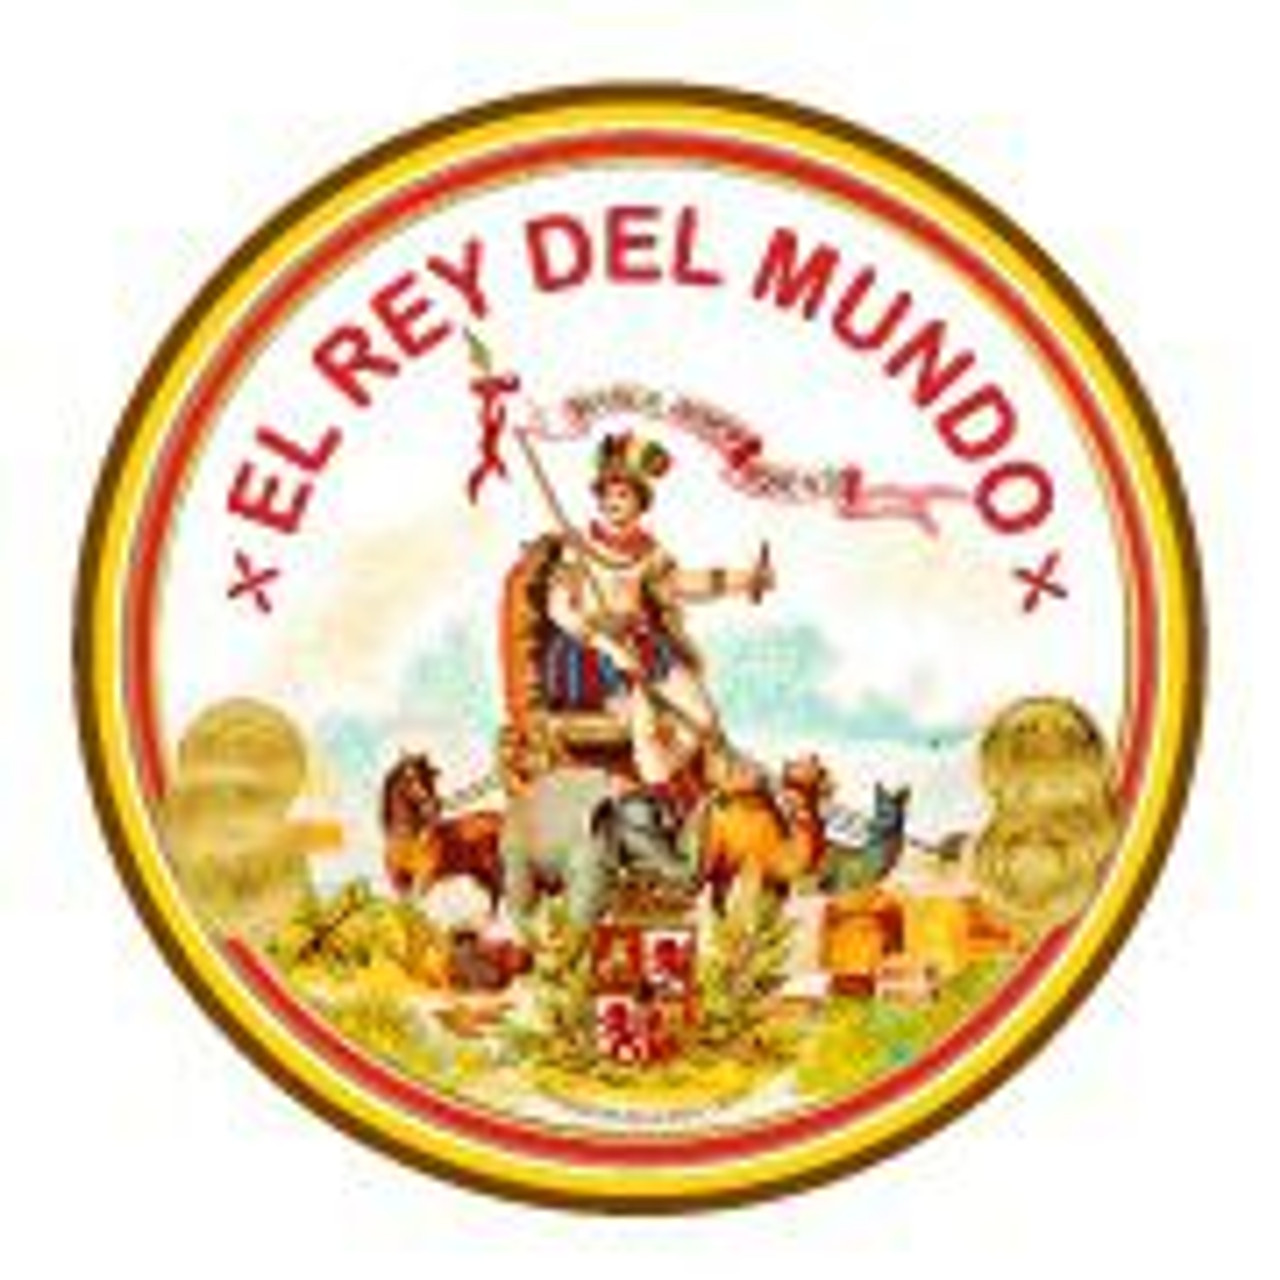 El Rey del Mundo Plantations Cigars - 6.5 x 30 (Box of 40)